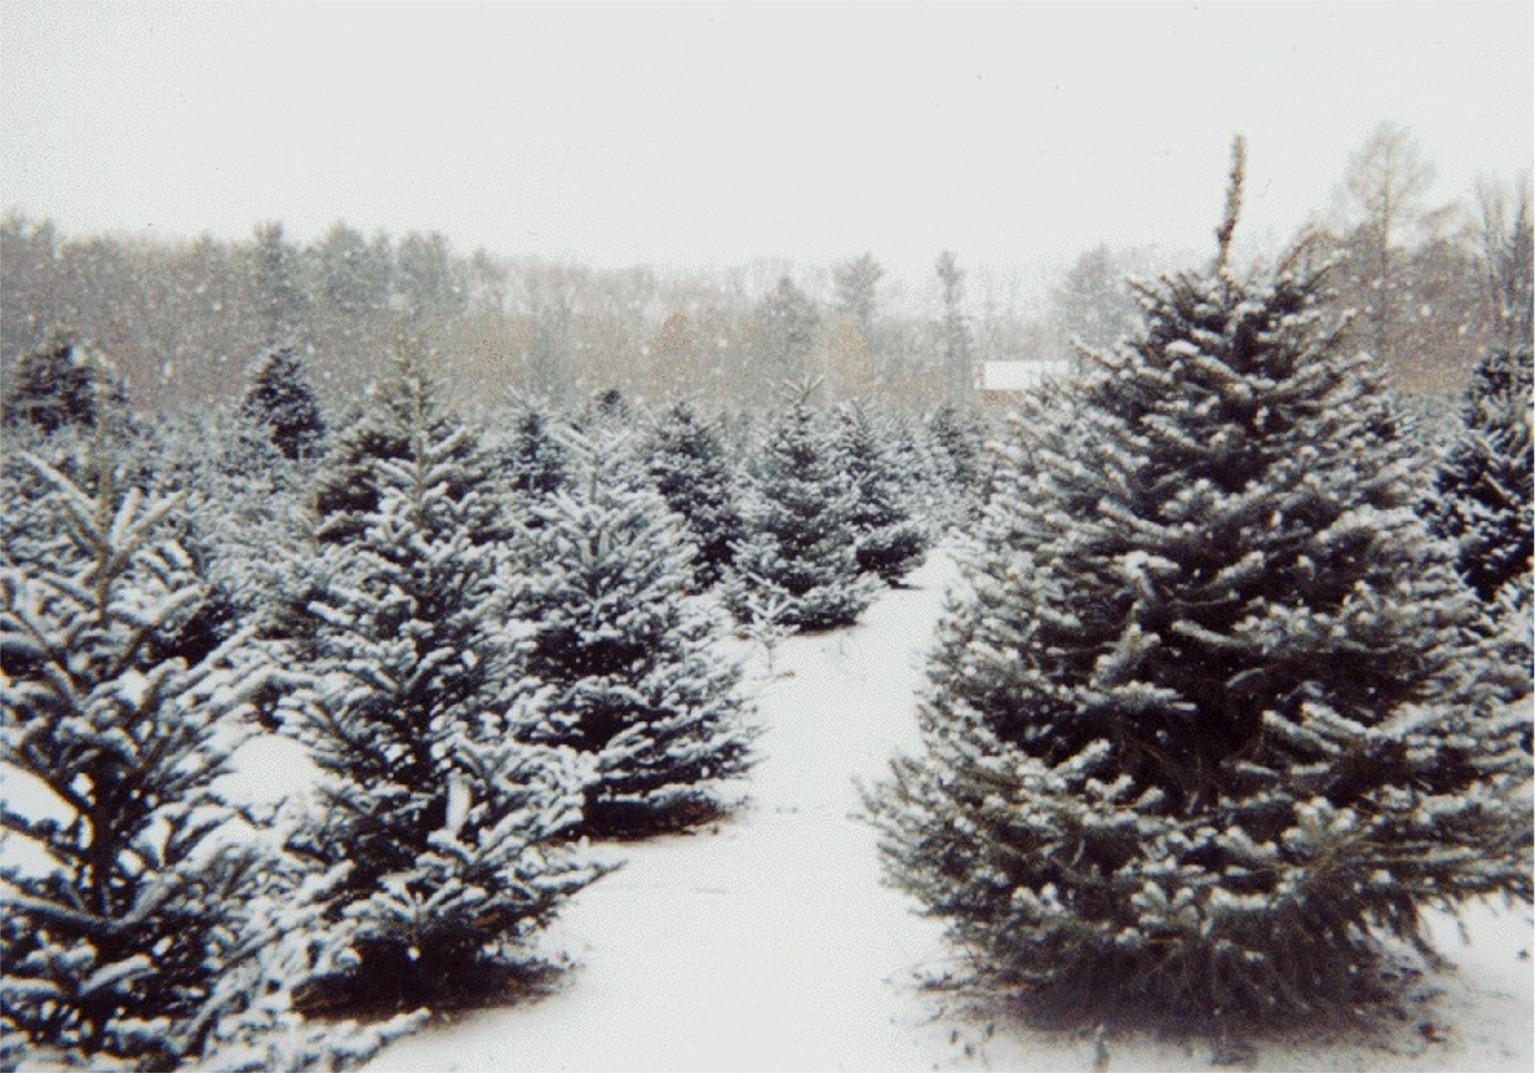 Miss Bee's Christmas Tree: How To Buy A Christmas Tree